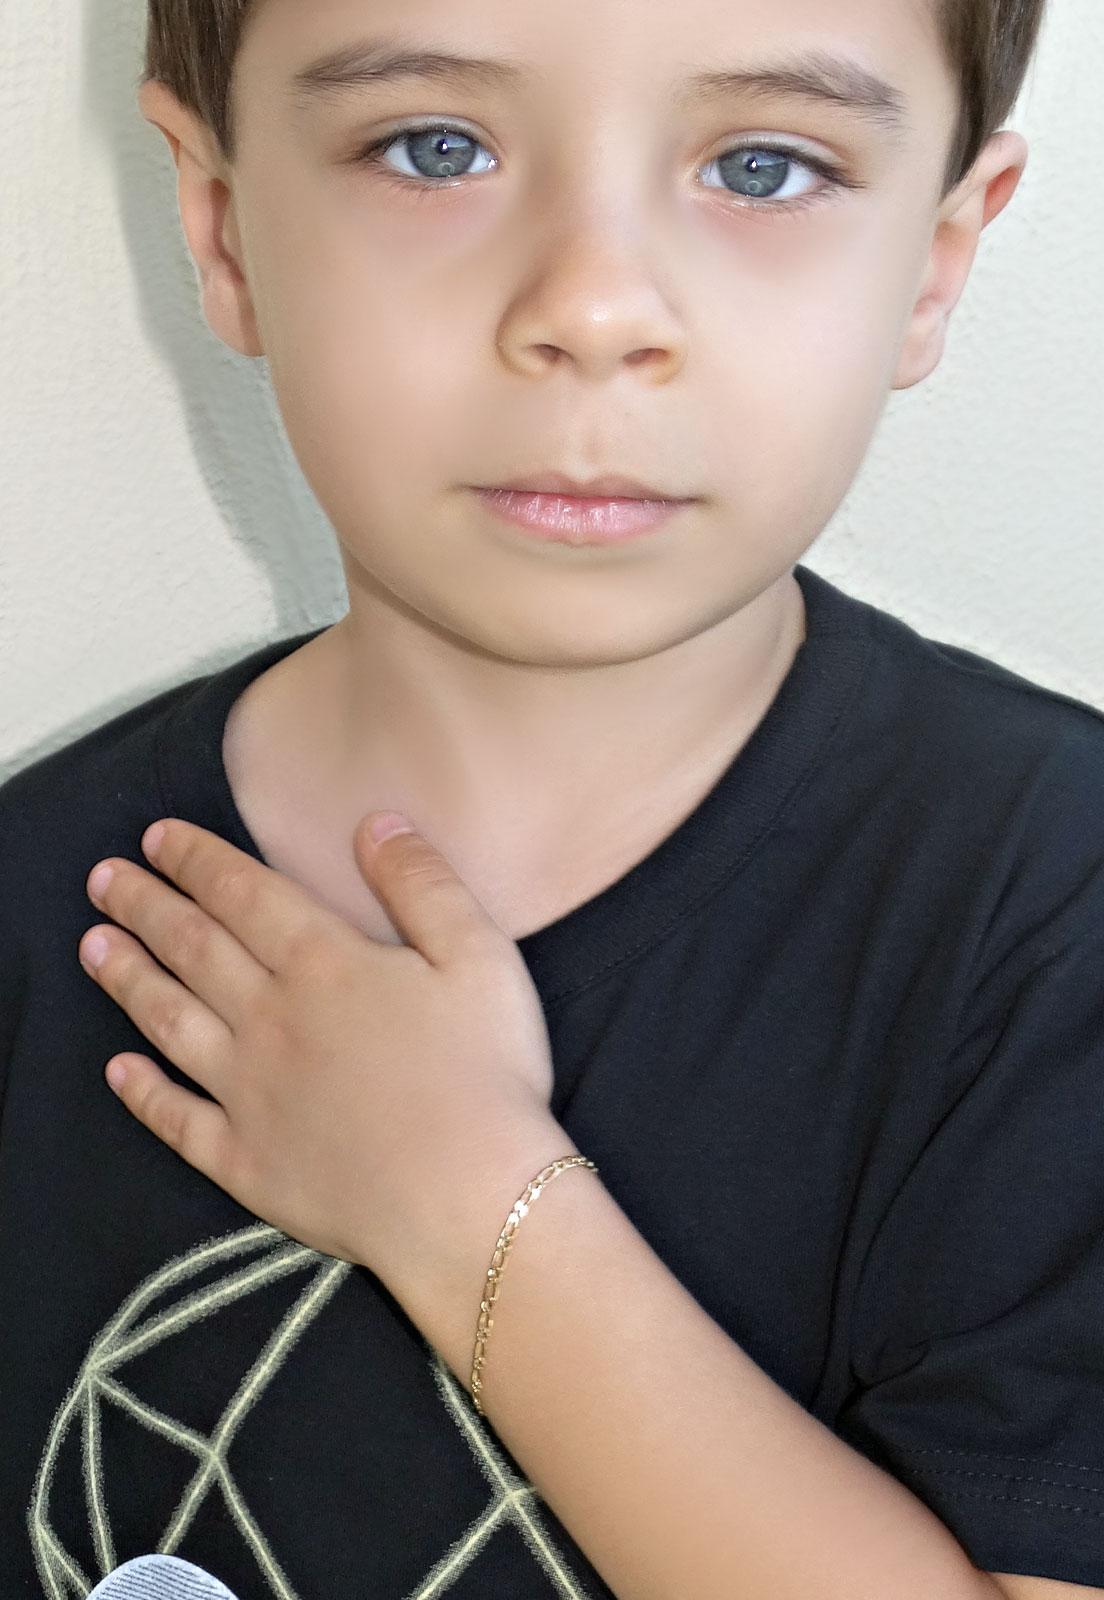 PULSEIRA ELOS GRUMET INFANTIL MENINO BANHADA A OURO